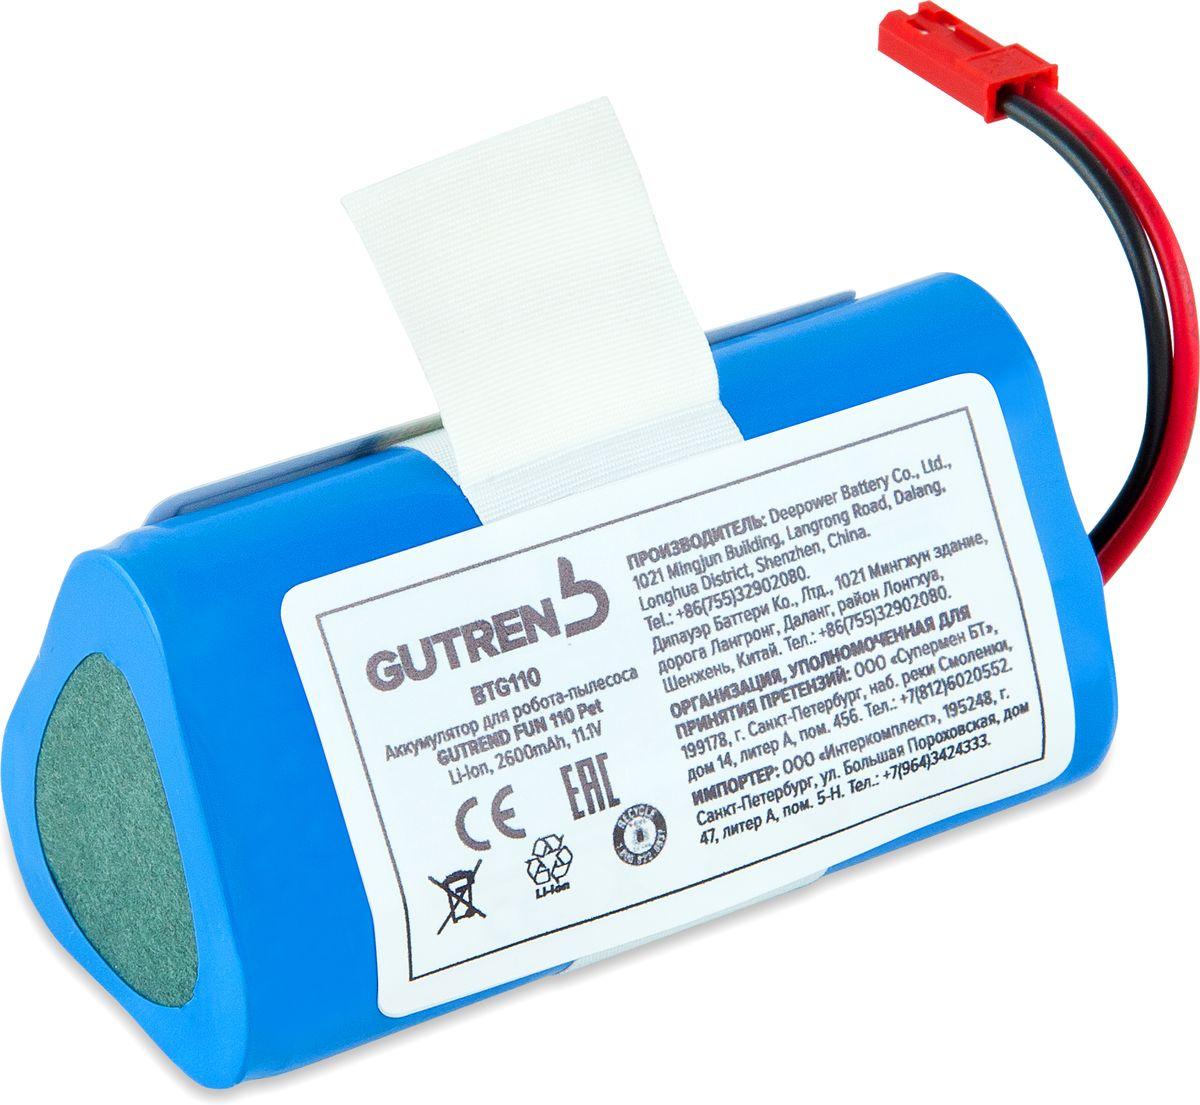 Gutrend BTG110 аккумуляторная батарея для Fun 110 PetBTG110Gutrend BTG110 - надежная оригинальная аккумуляторная батарея типа Li-Ion емкостью 2600 мАч для популярного робота-пылесоса Fun 110 Pet.